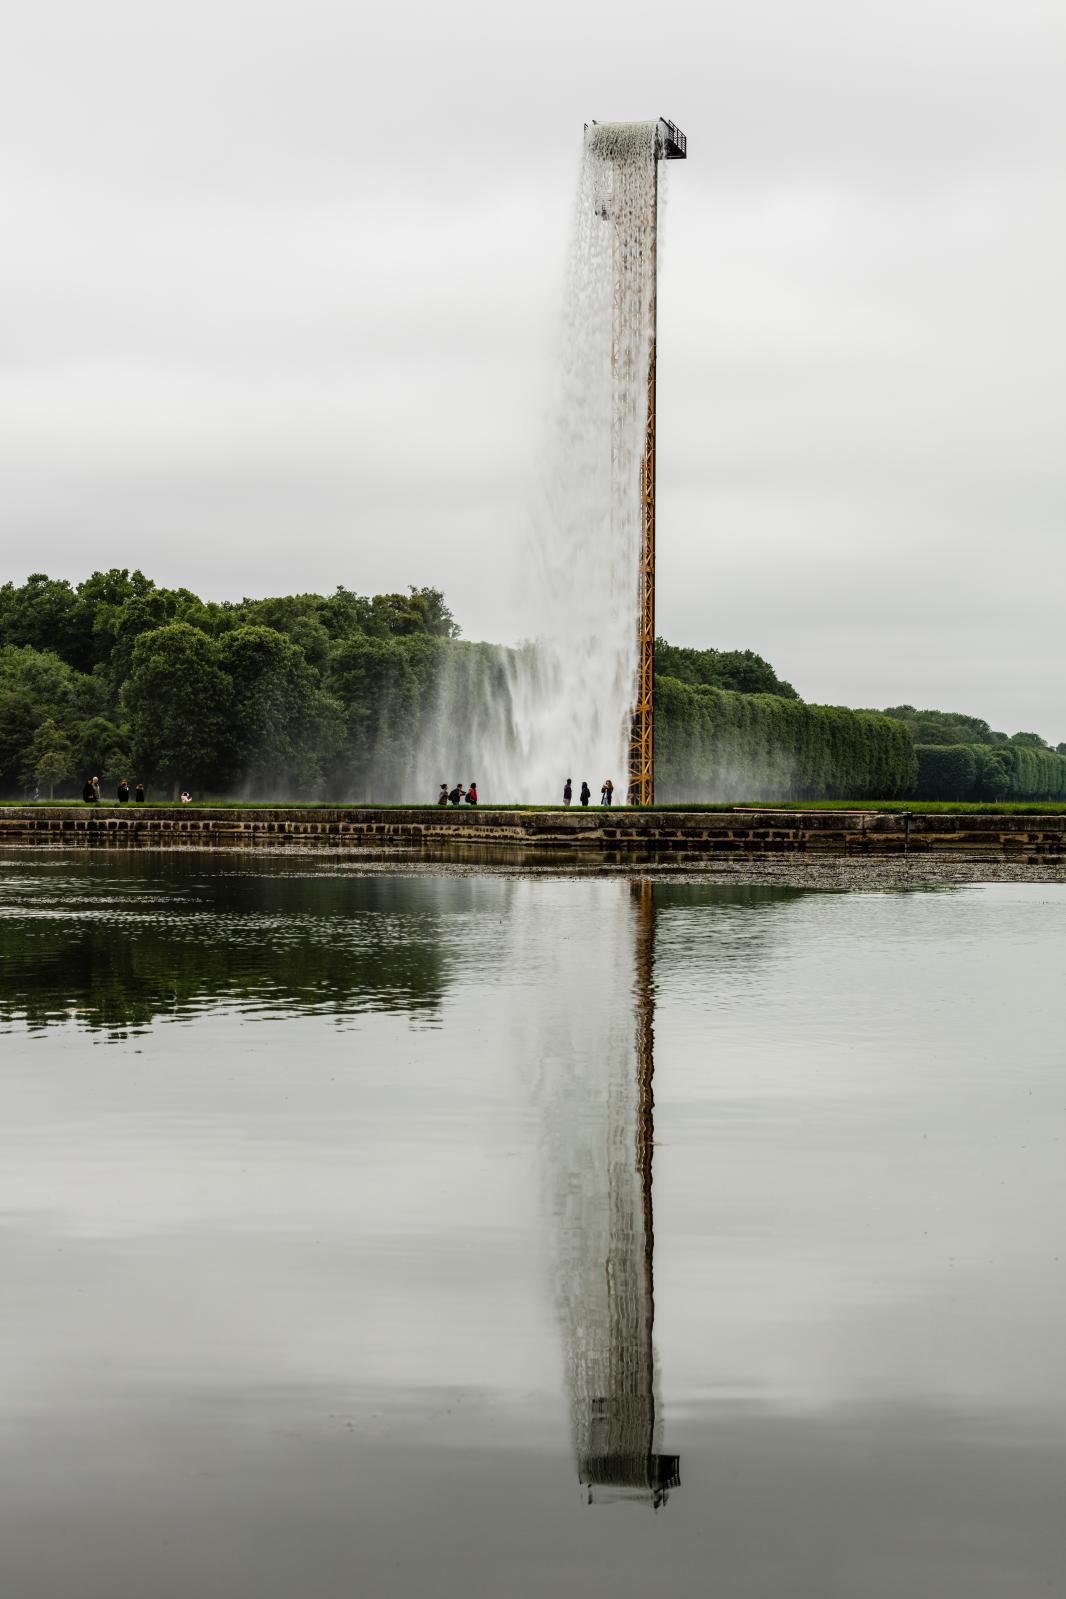 Waterfall, grue, eau, acier inoxydable, tuyau, pompe, ballast, château de Versailles, 2016.